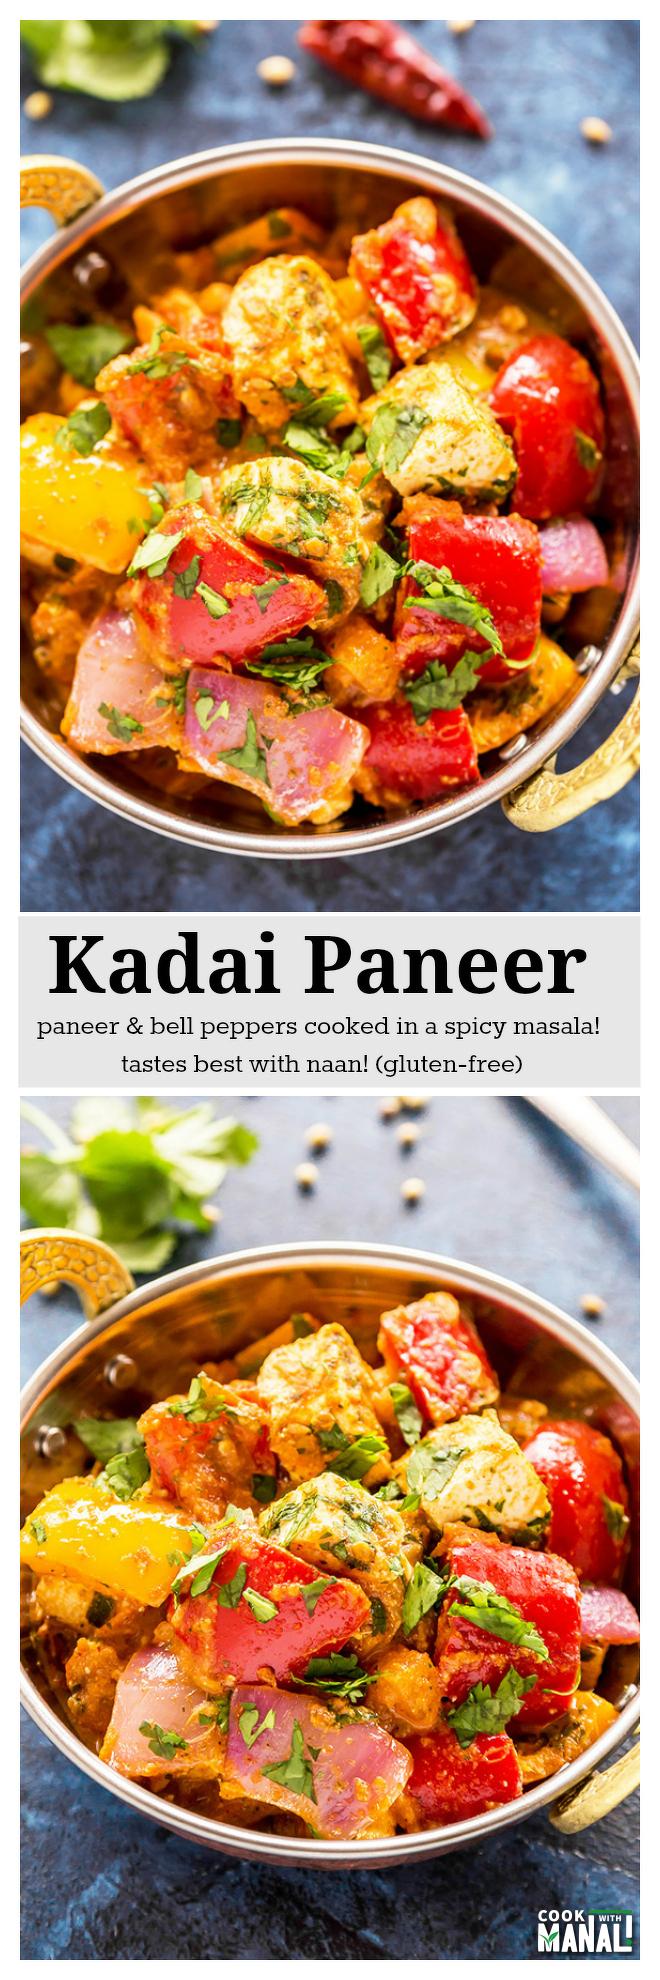 Kadai paneer cook with manali kadai paneer save forumfinder Gallery